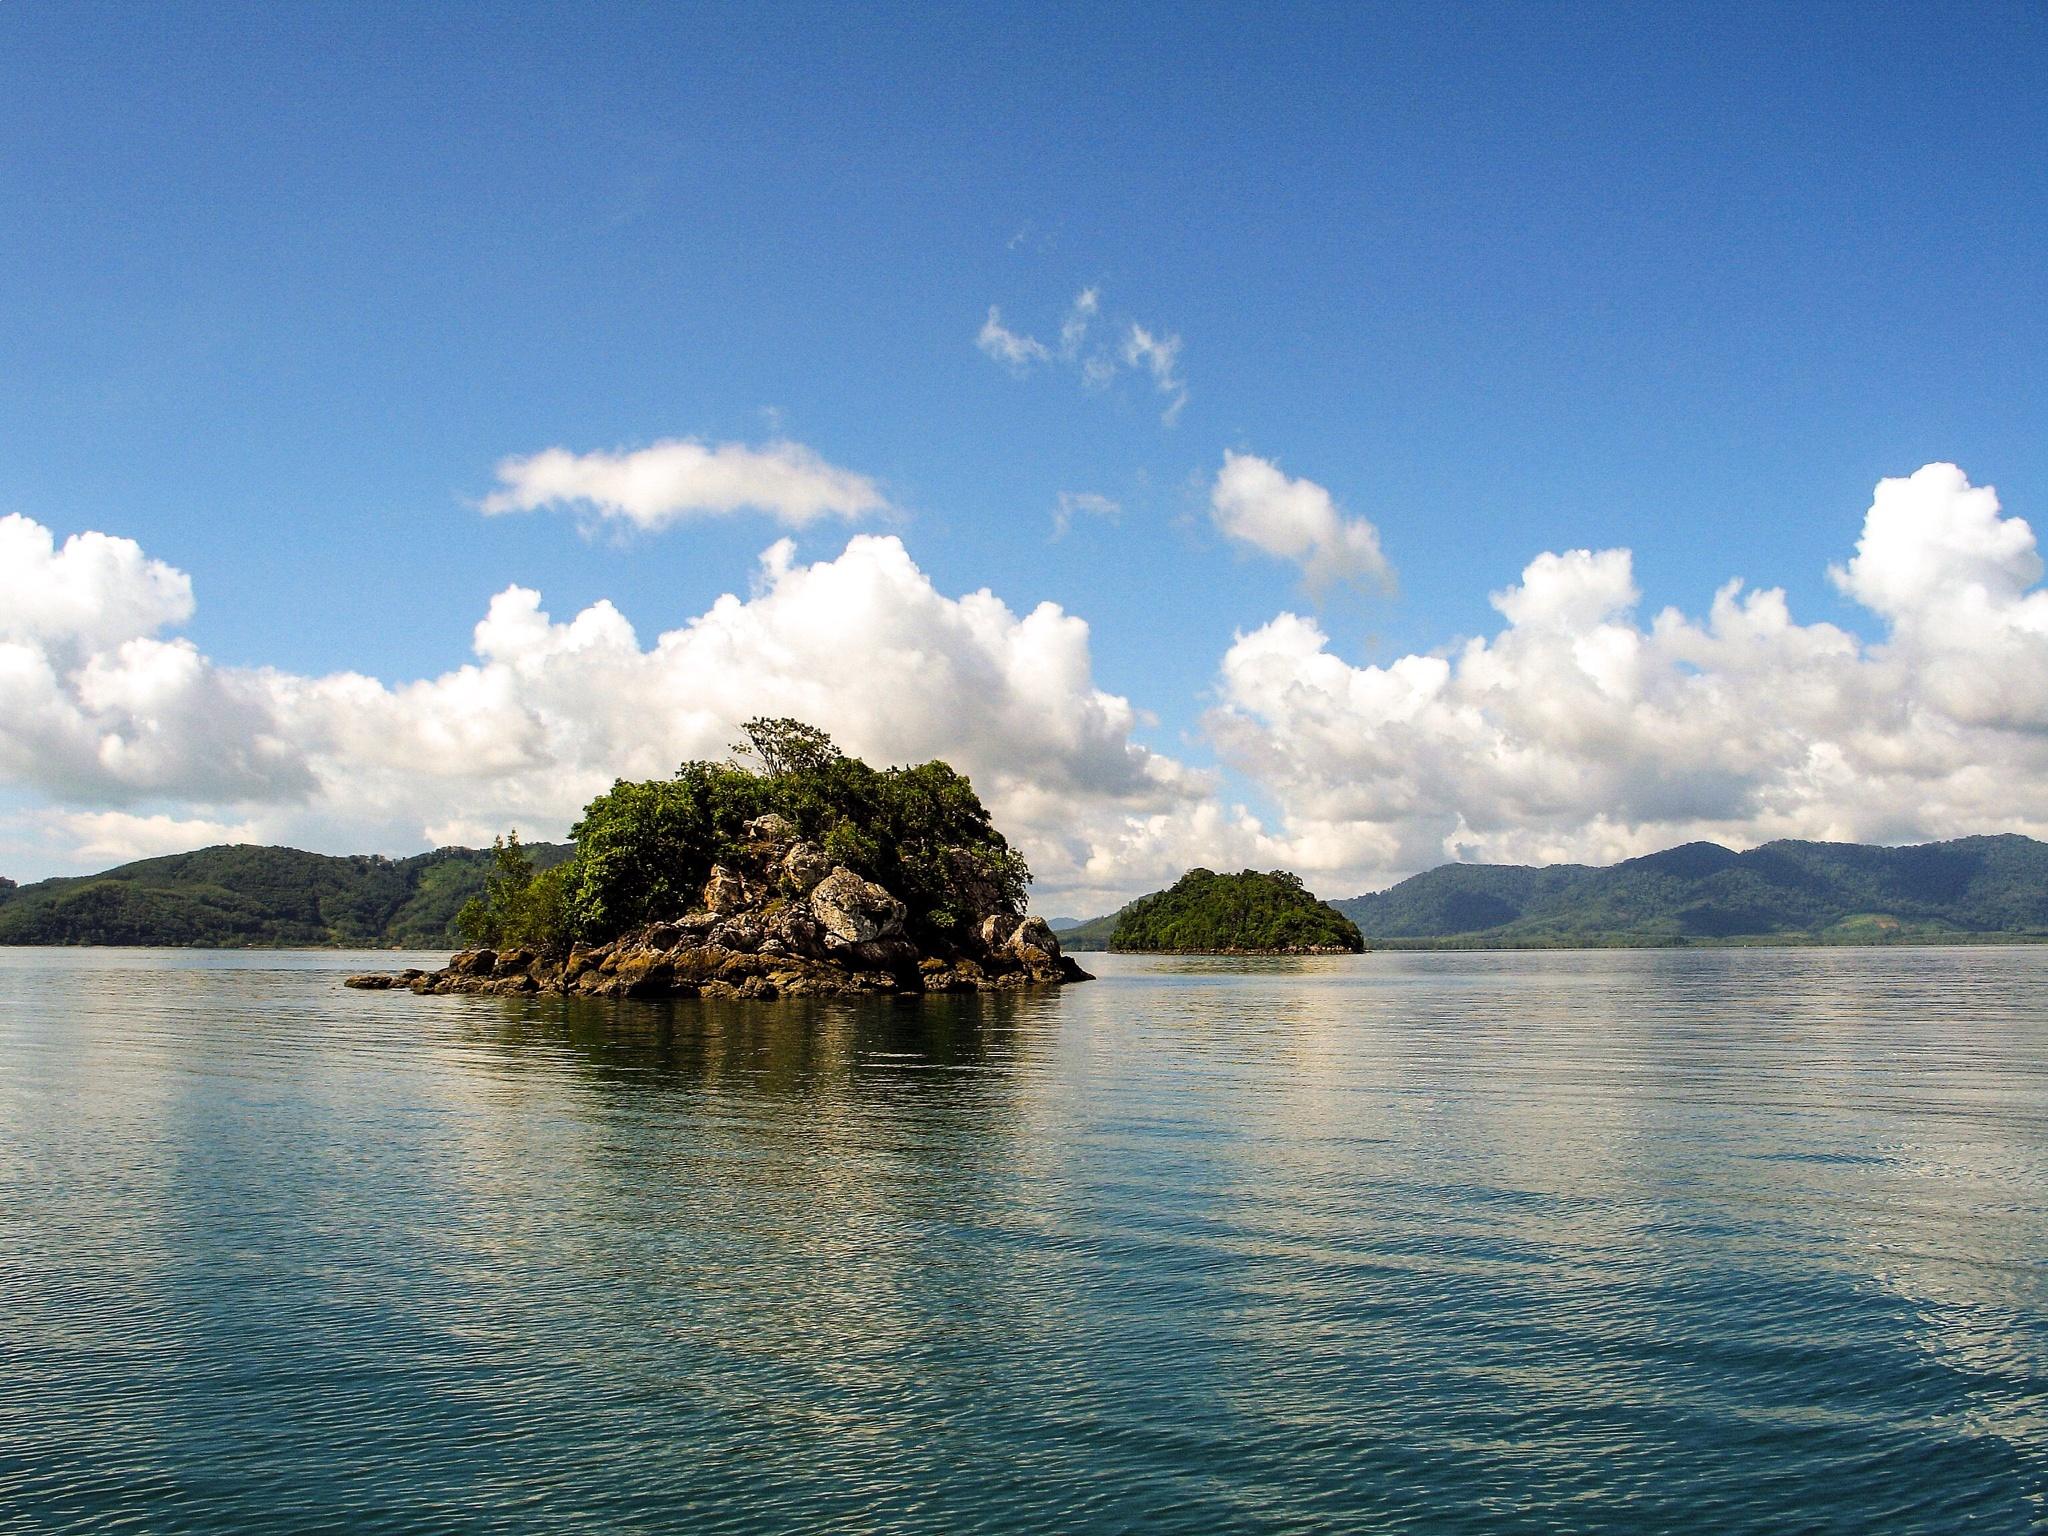 Islands near Phuket,Thailand  by Adi Gli